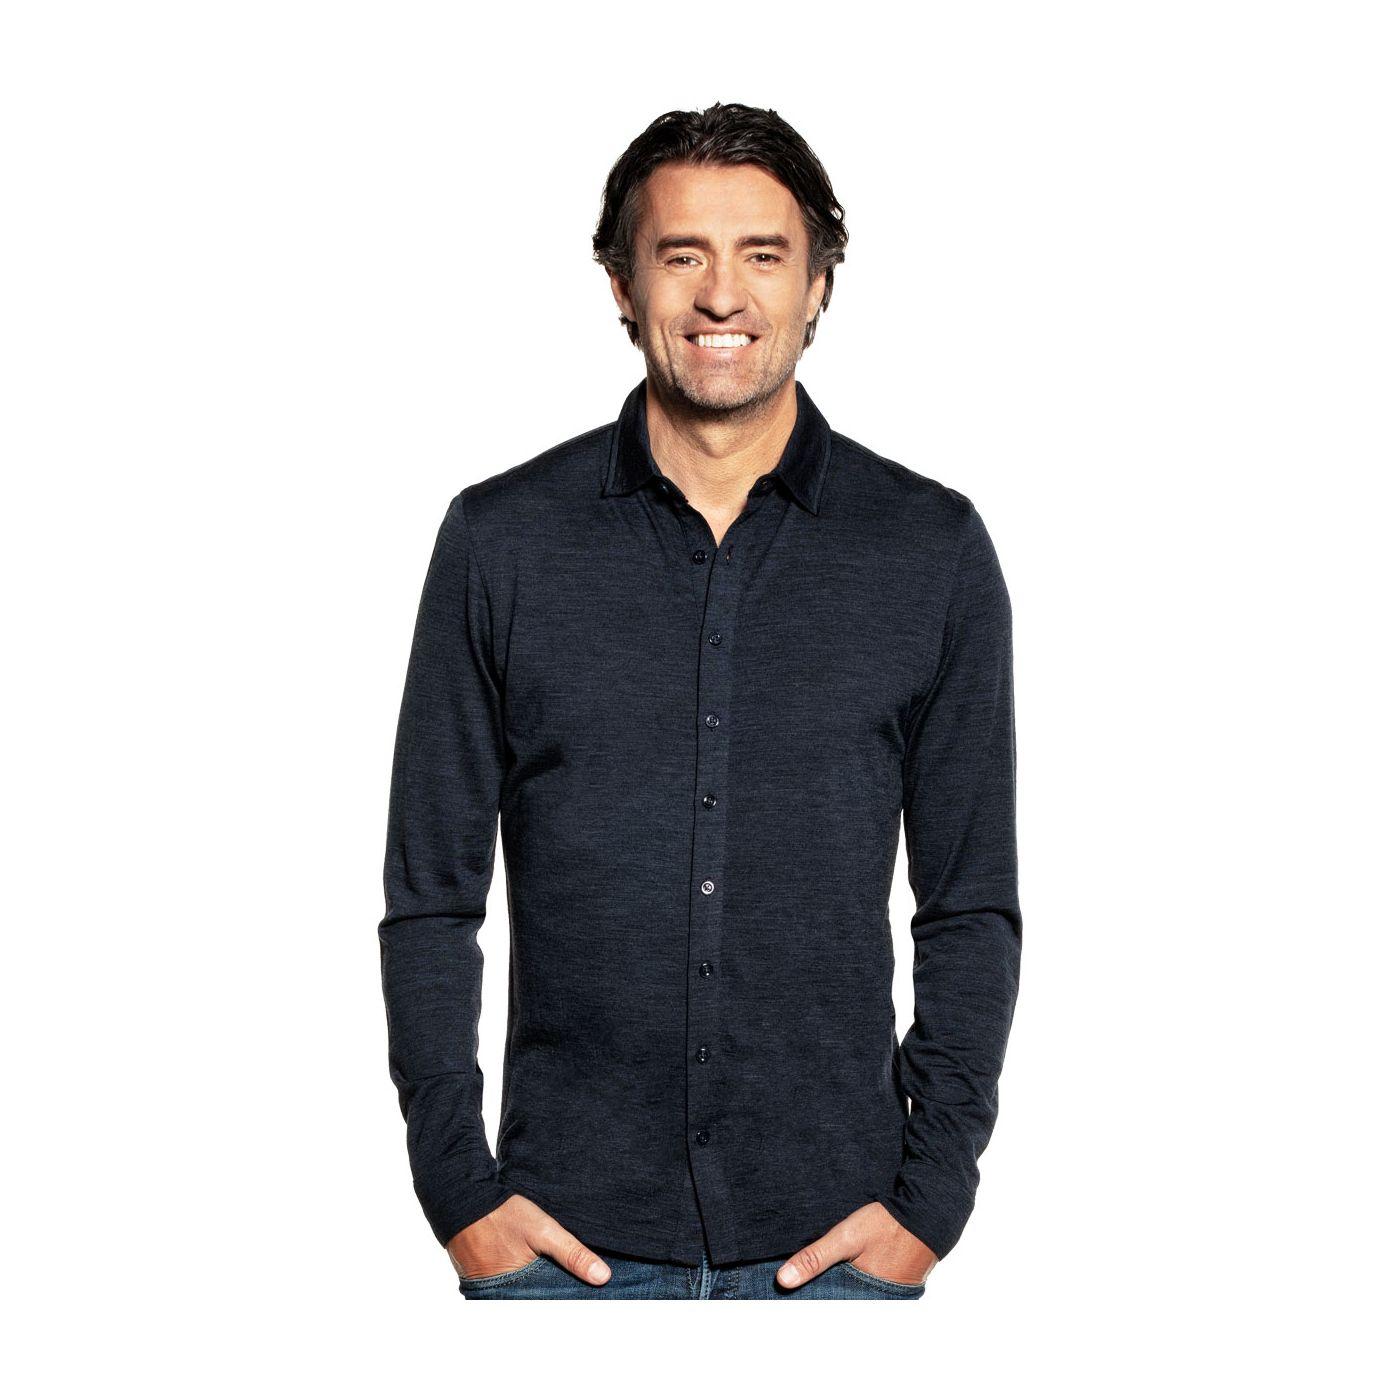 Shirt Button Up Blue Whale